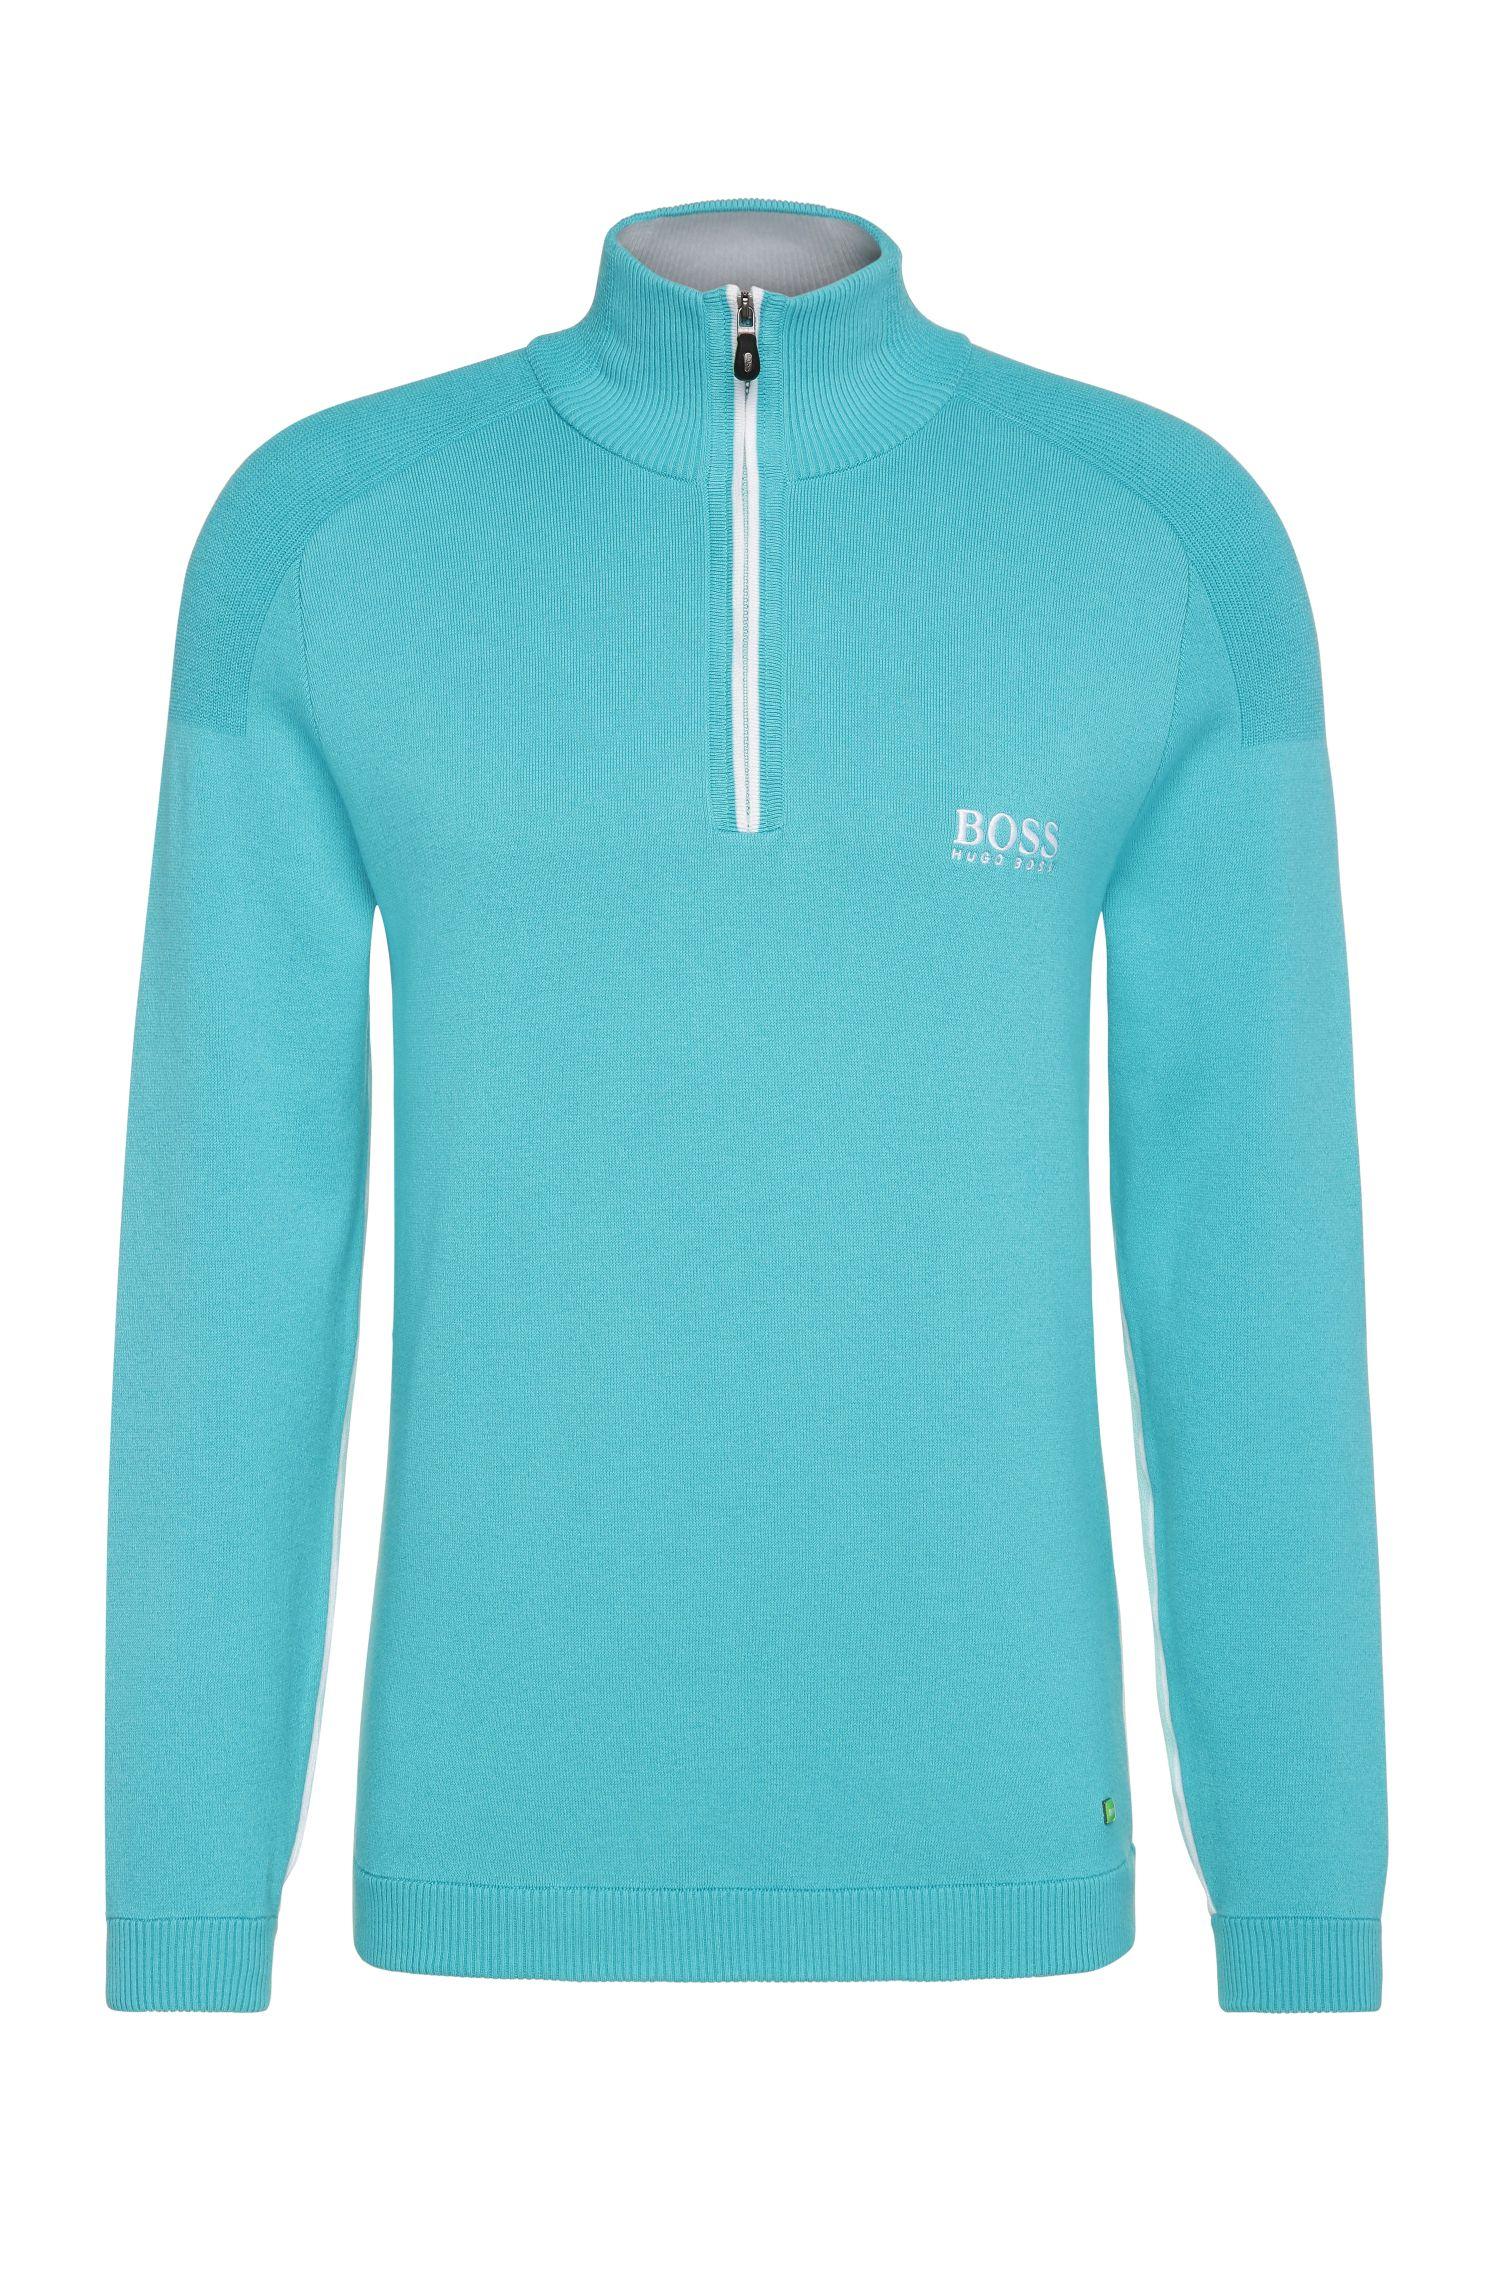 'Zayo MK SR17' | Stretch Cotton Water Repellent Troyer Sweater